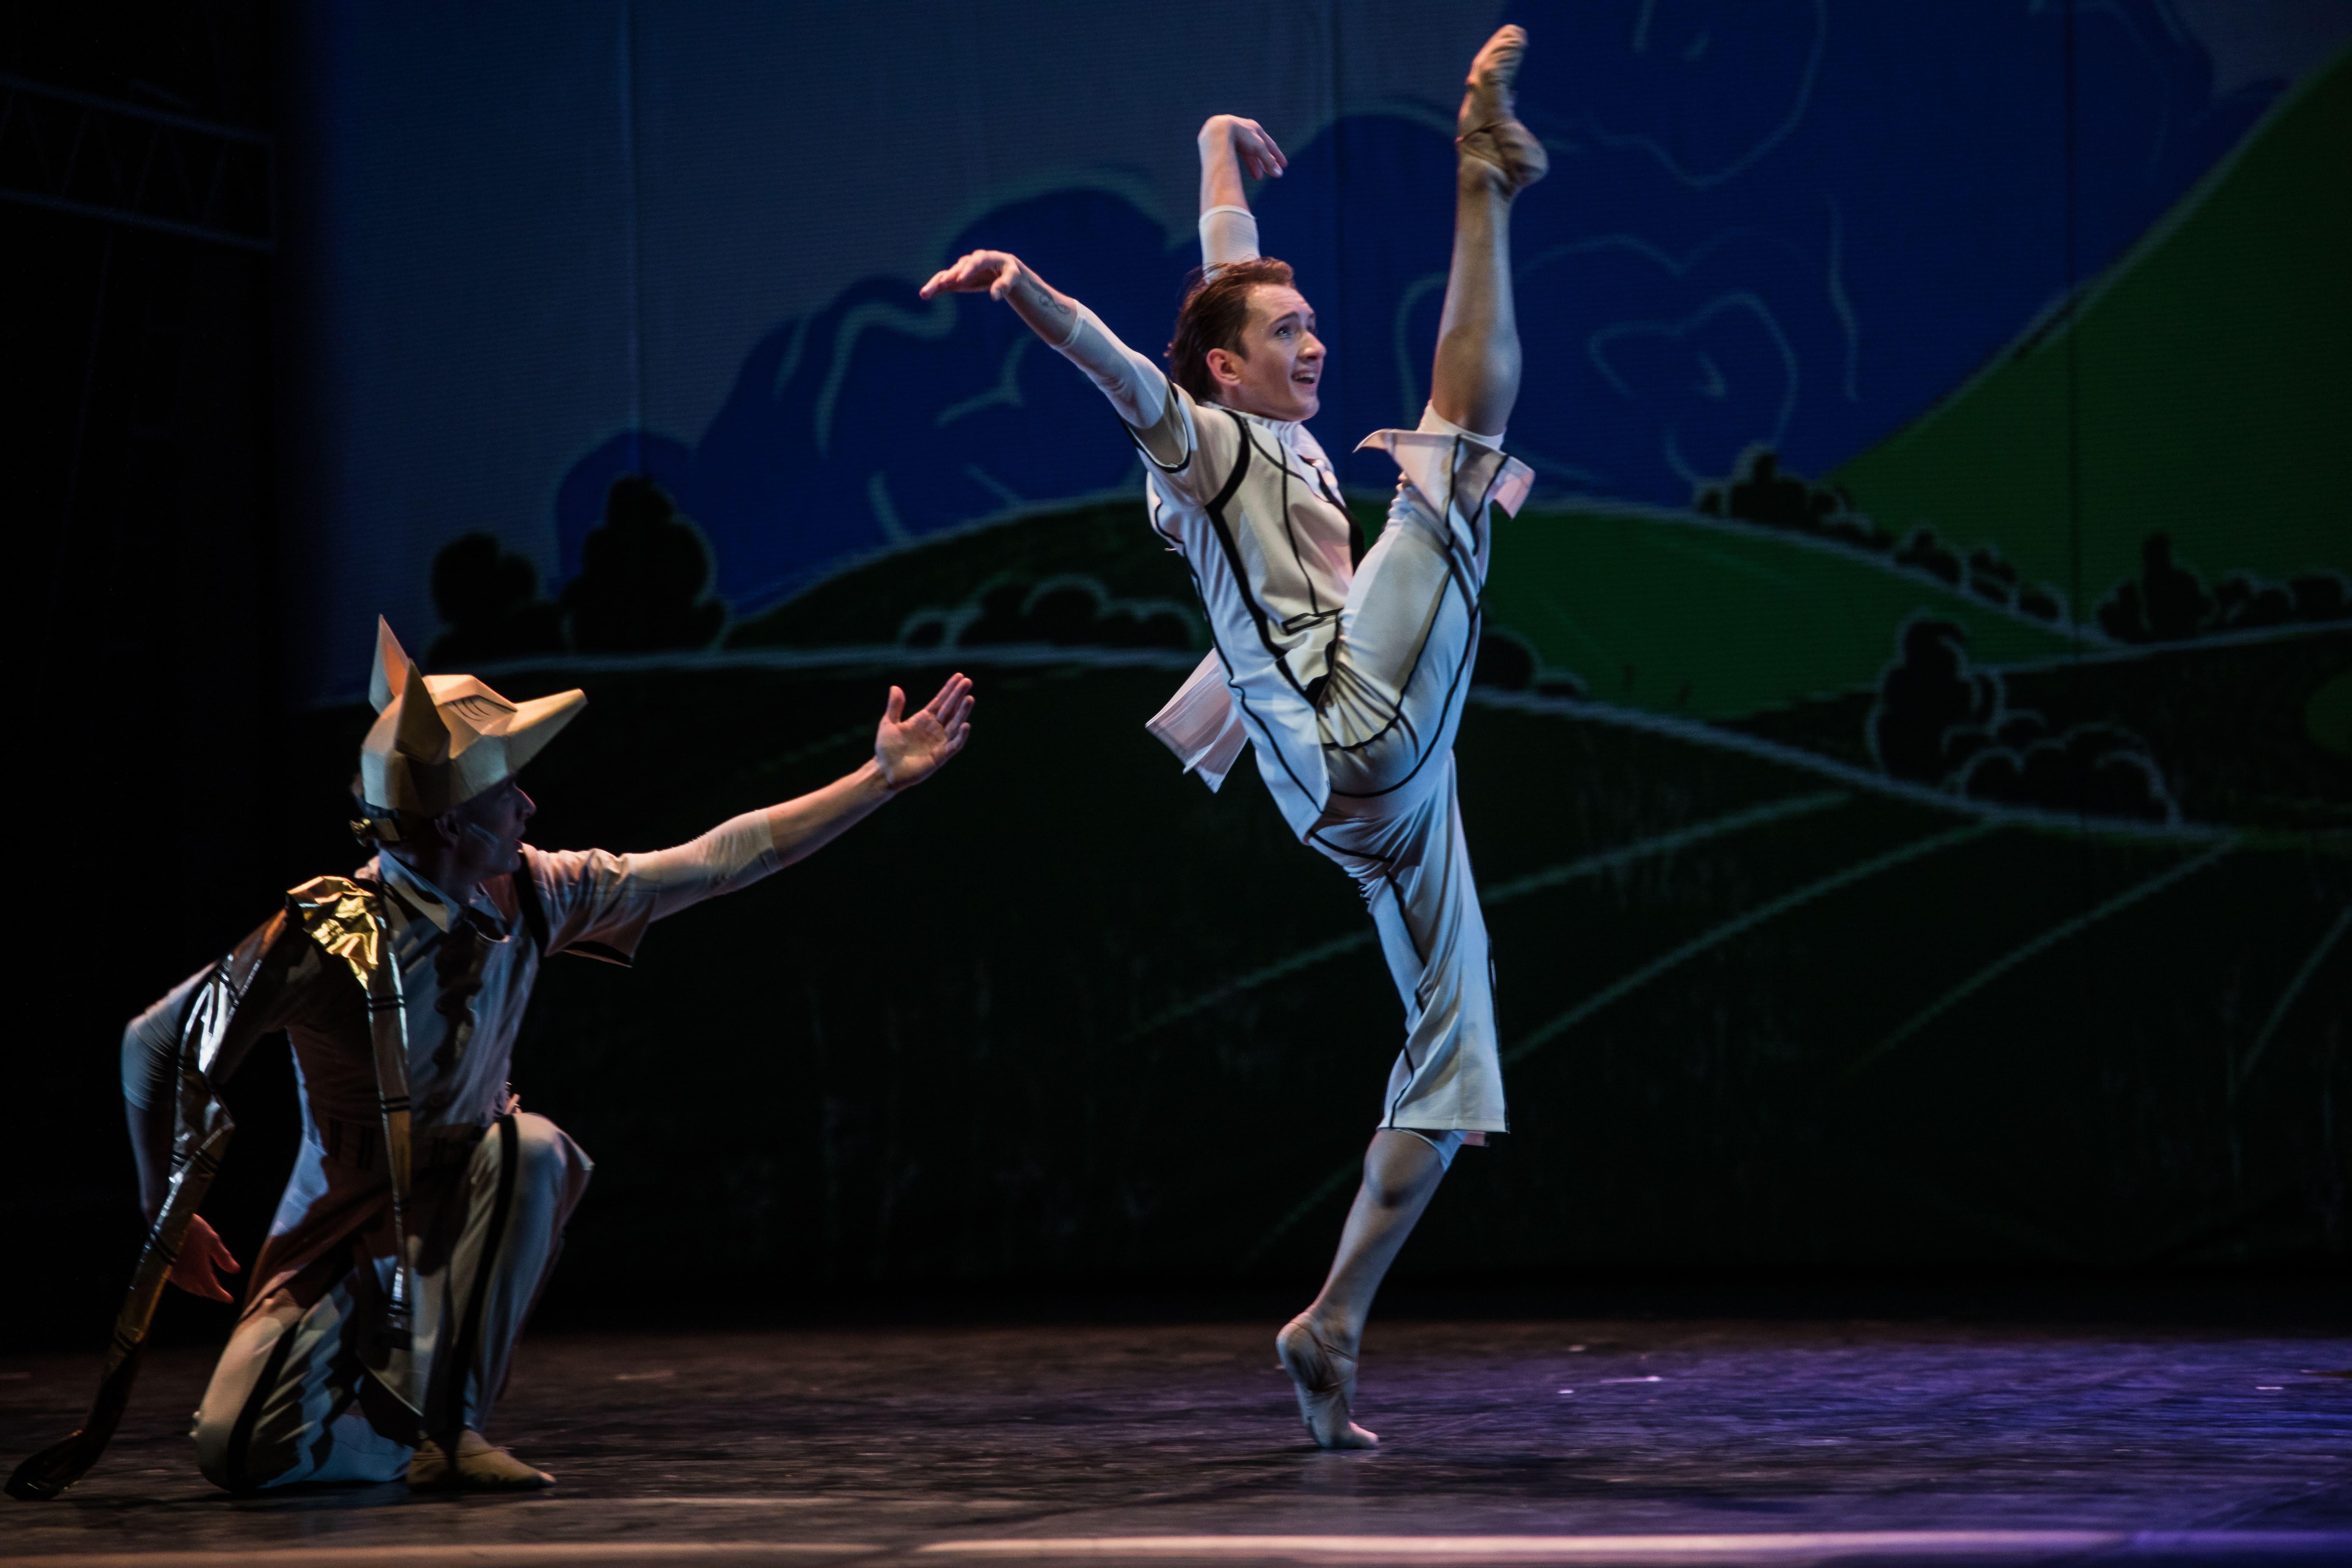 ТЕАТР Kyiv Modern Ballet. Маленький принц. Pаду Поклитару-4